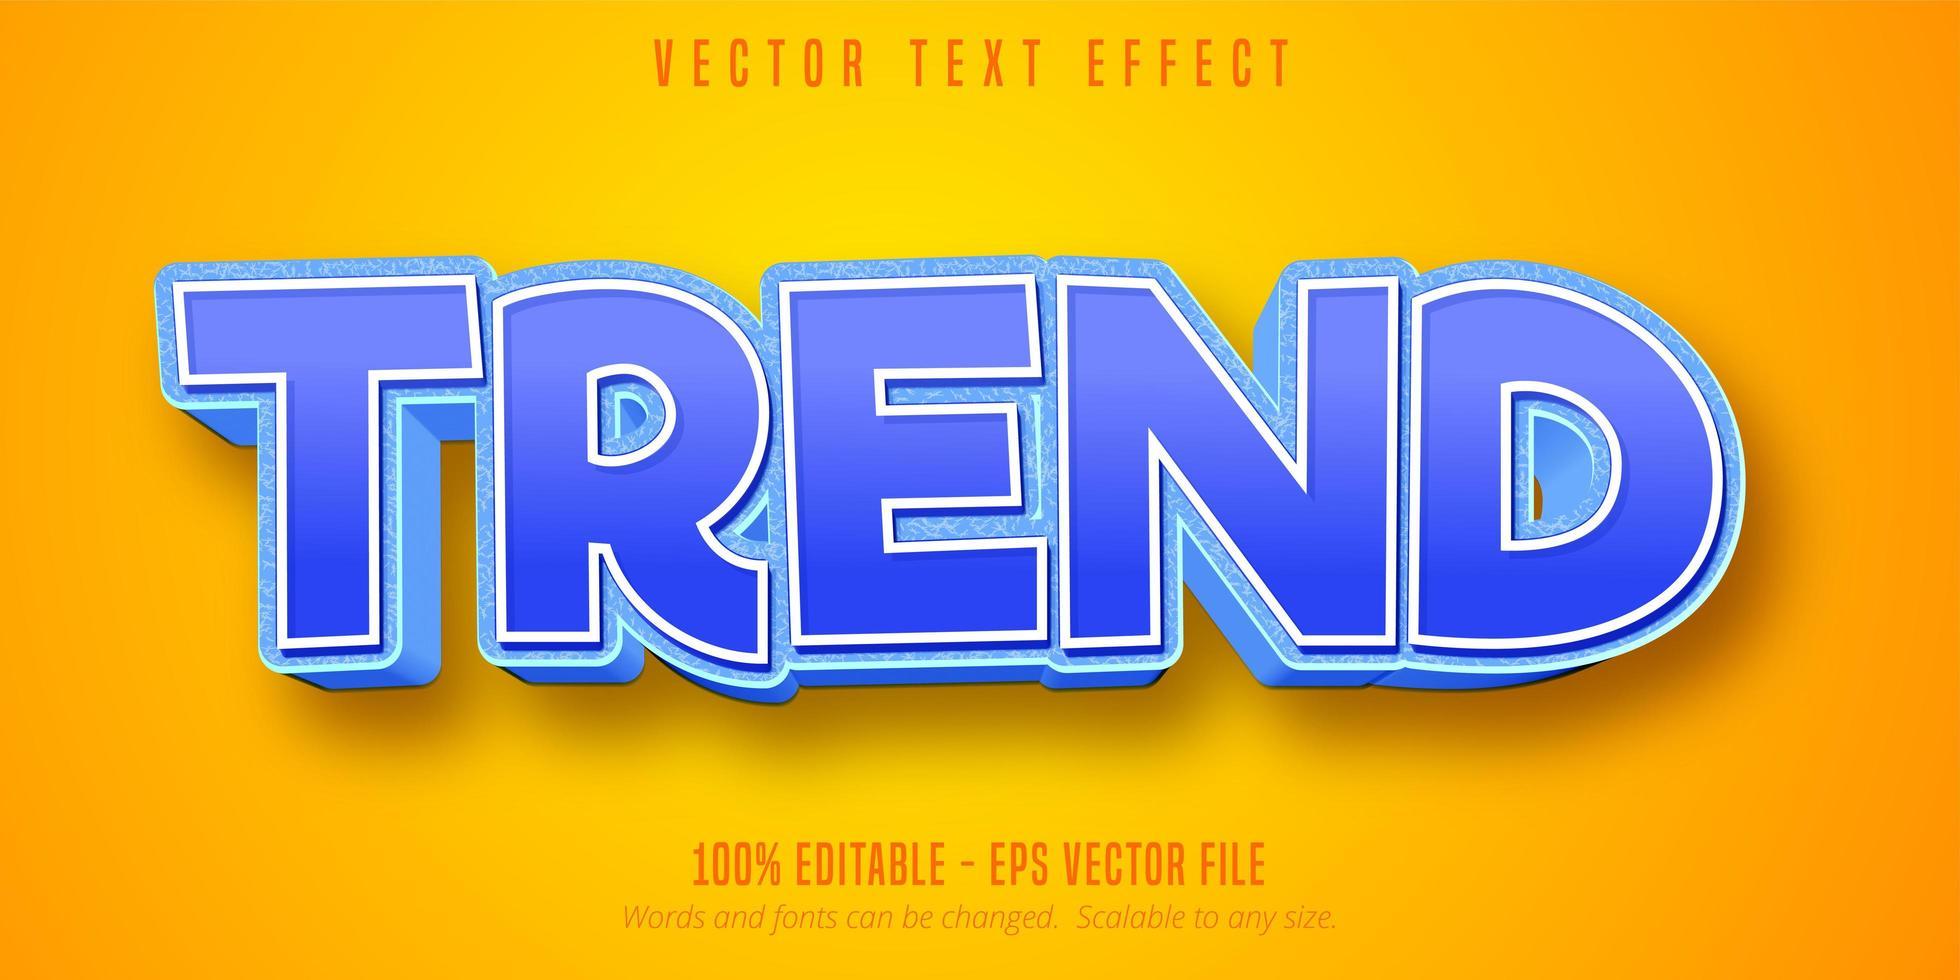 blå, vit trendtext, tecknad stiltexteffekt vektor